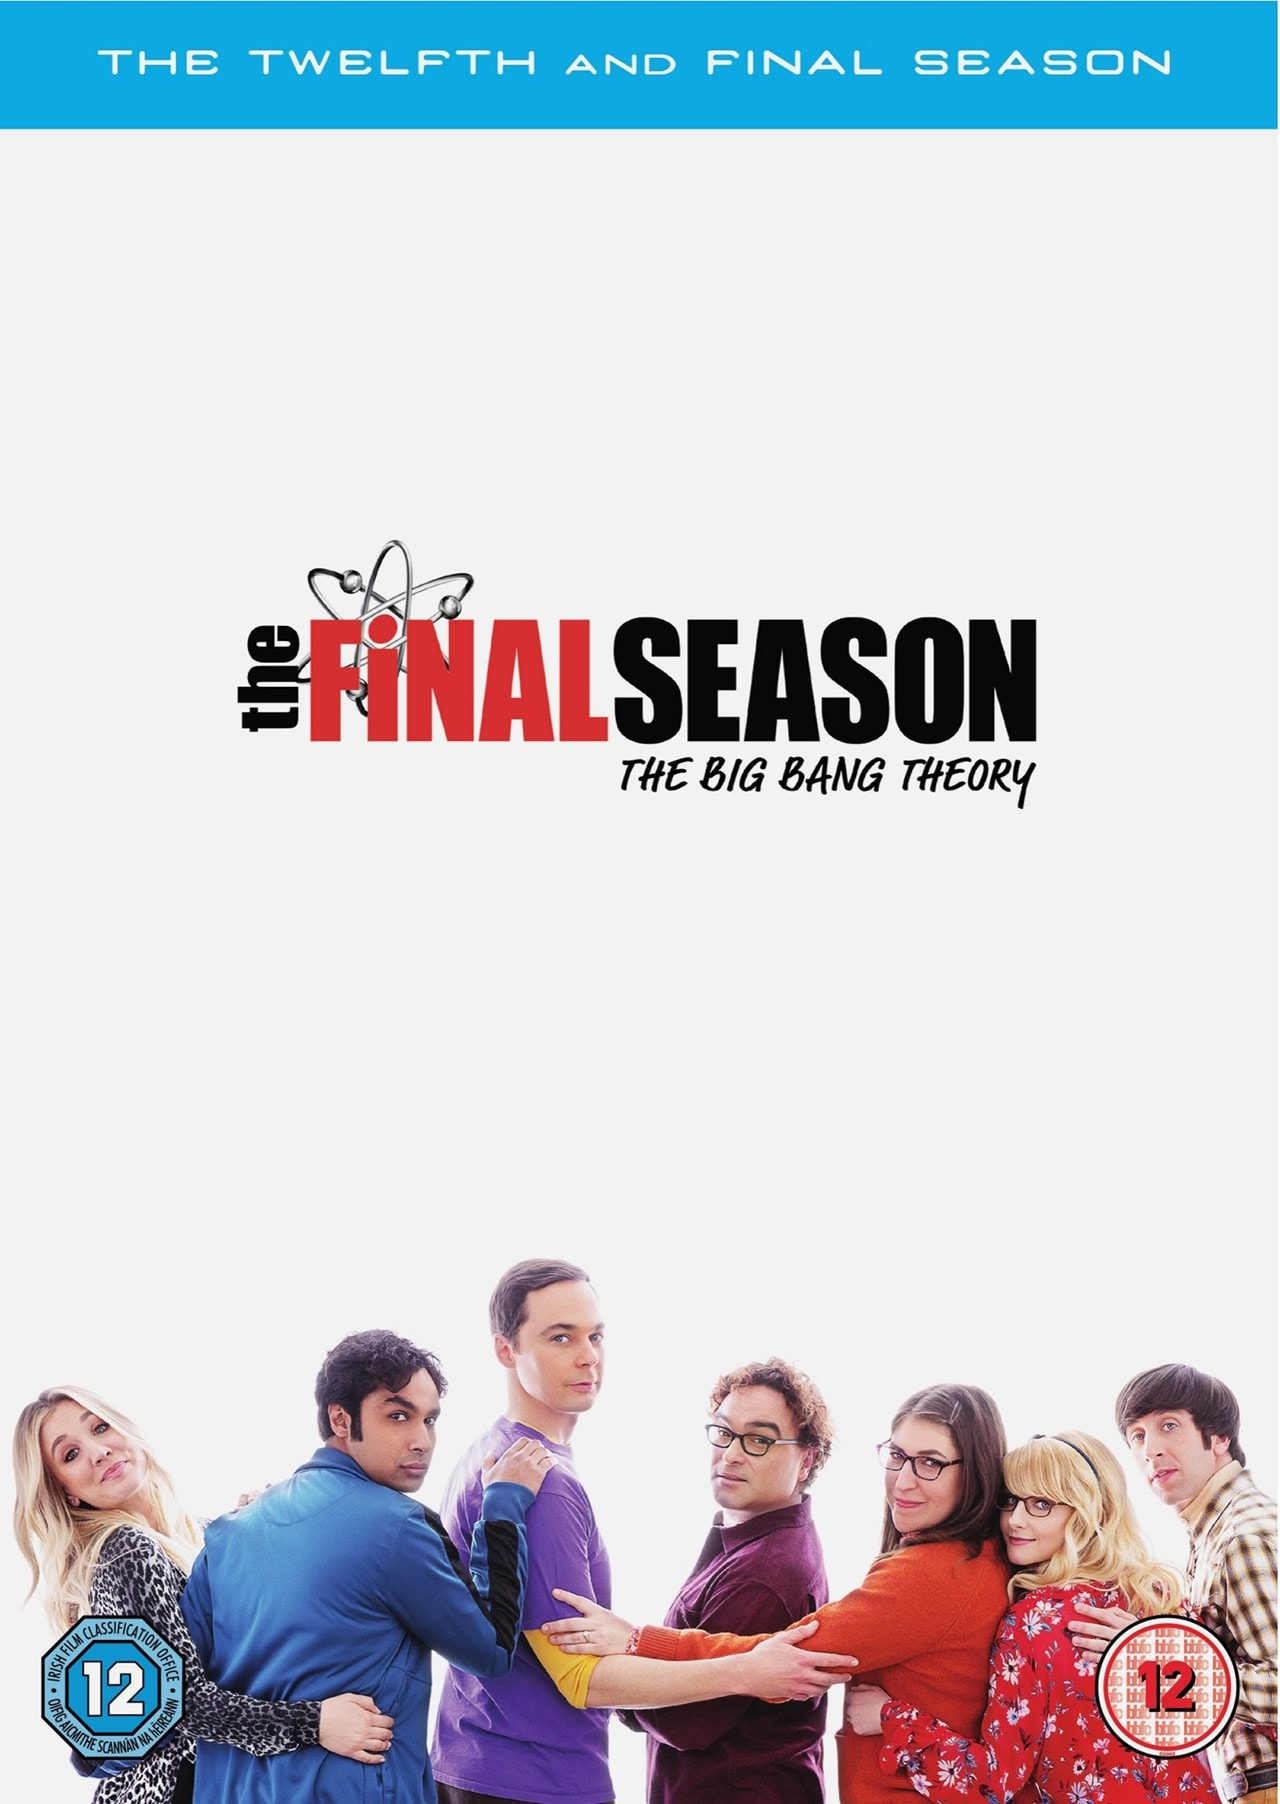 The Big Bang Theory: The Twelfth and Final Season - 1